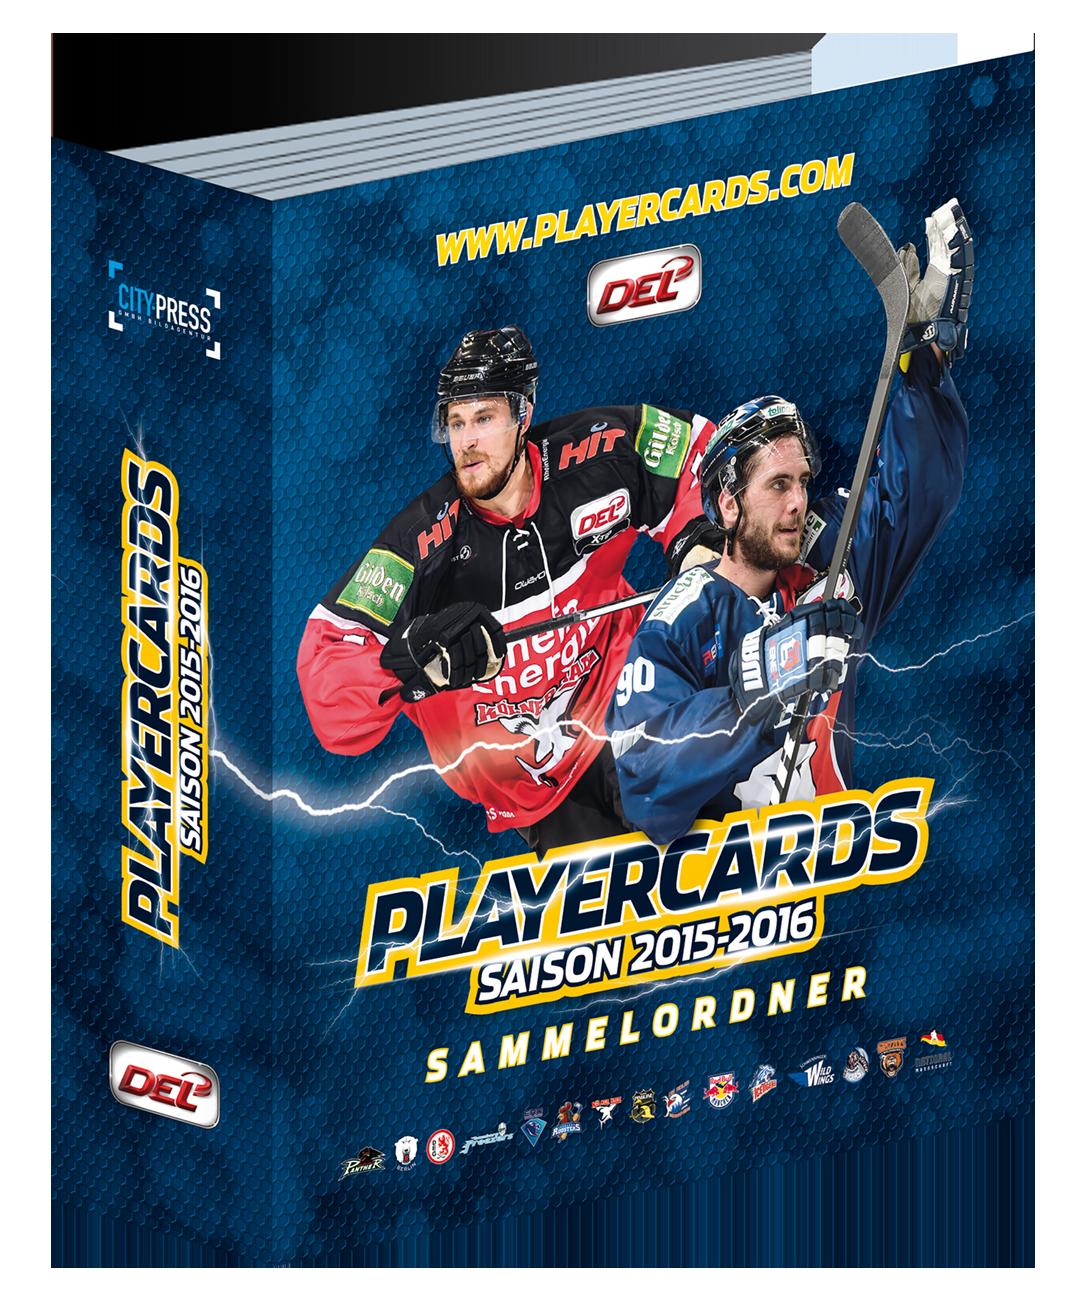 DEL Playercards Sammelordner - 2015/2016